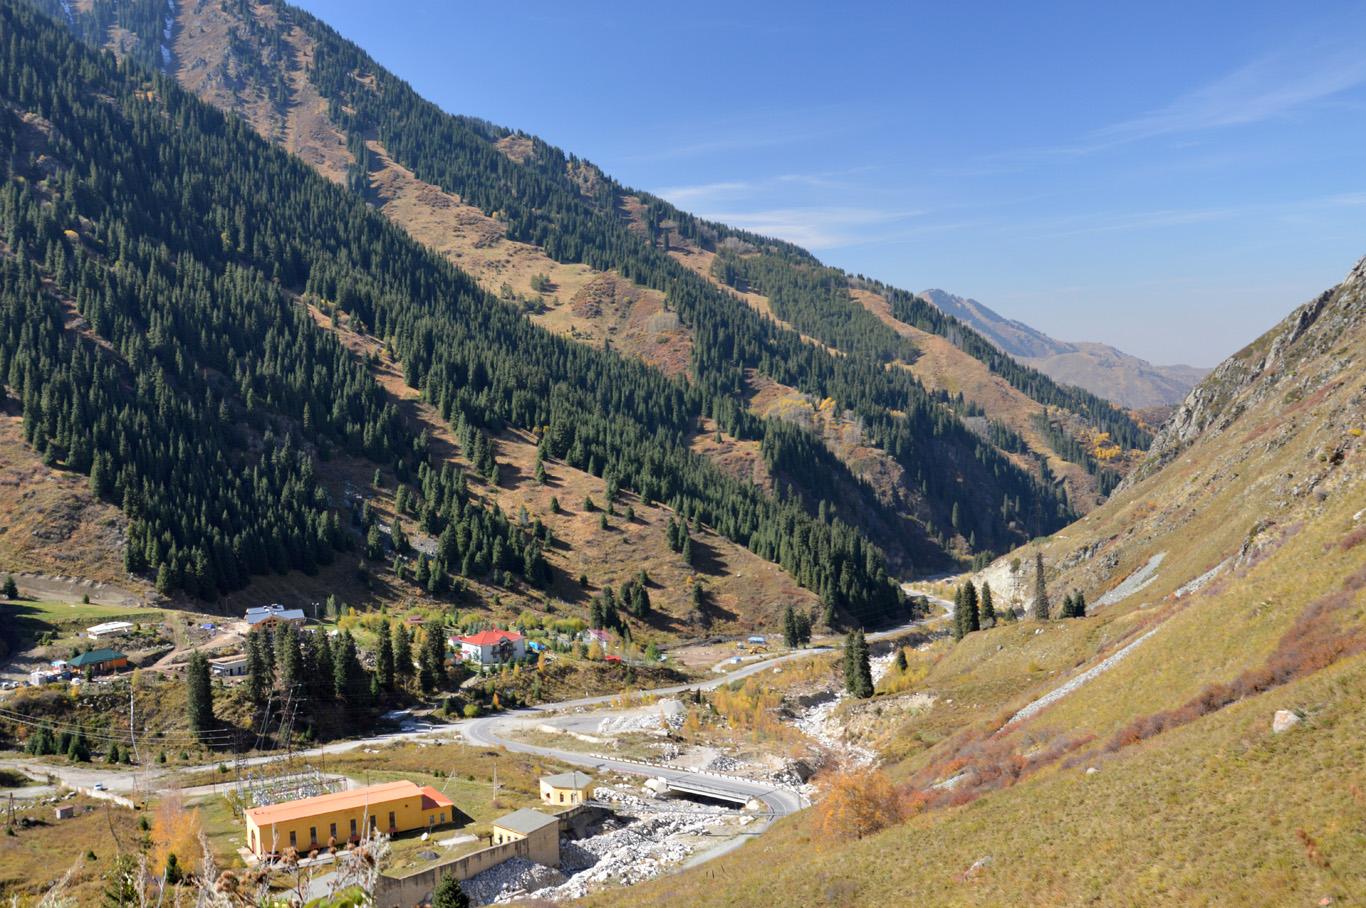 Ile Alatau Mountain range on the way from Almaty